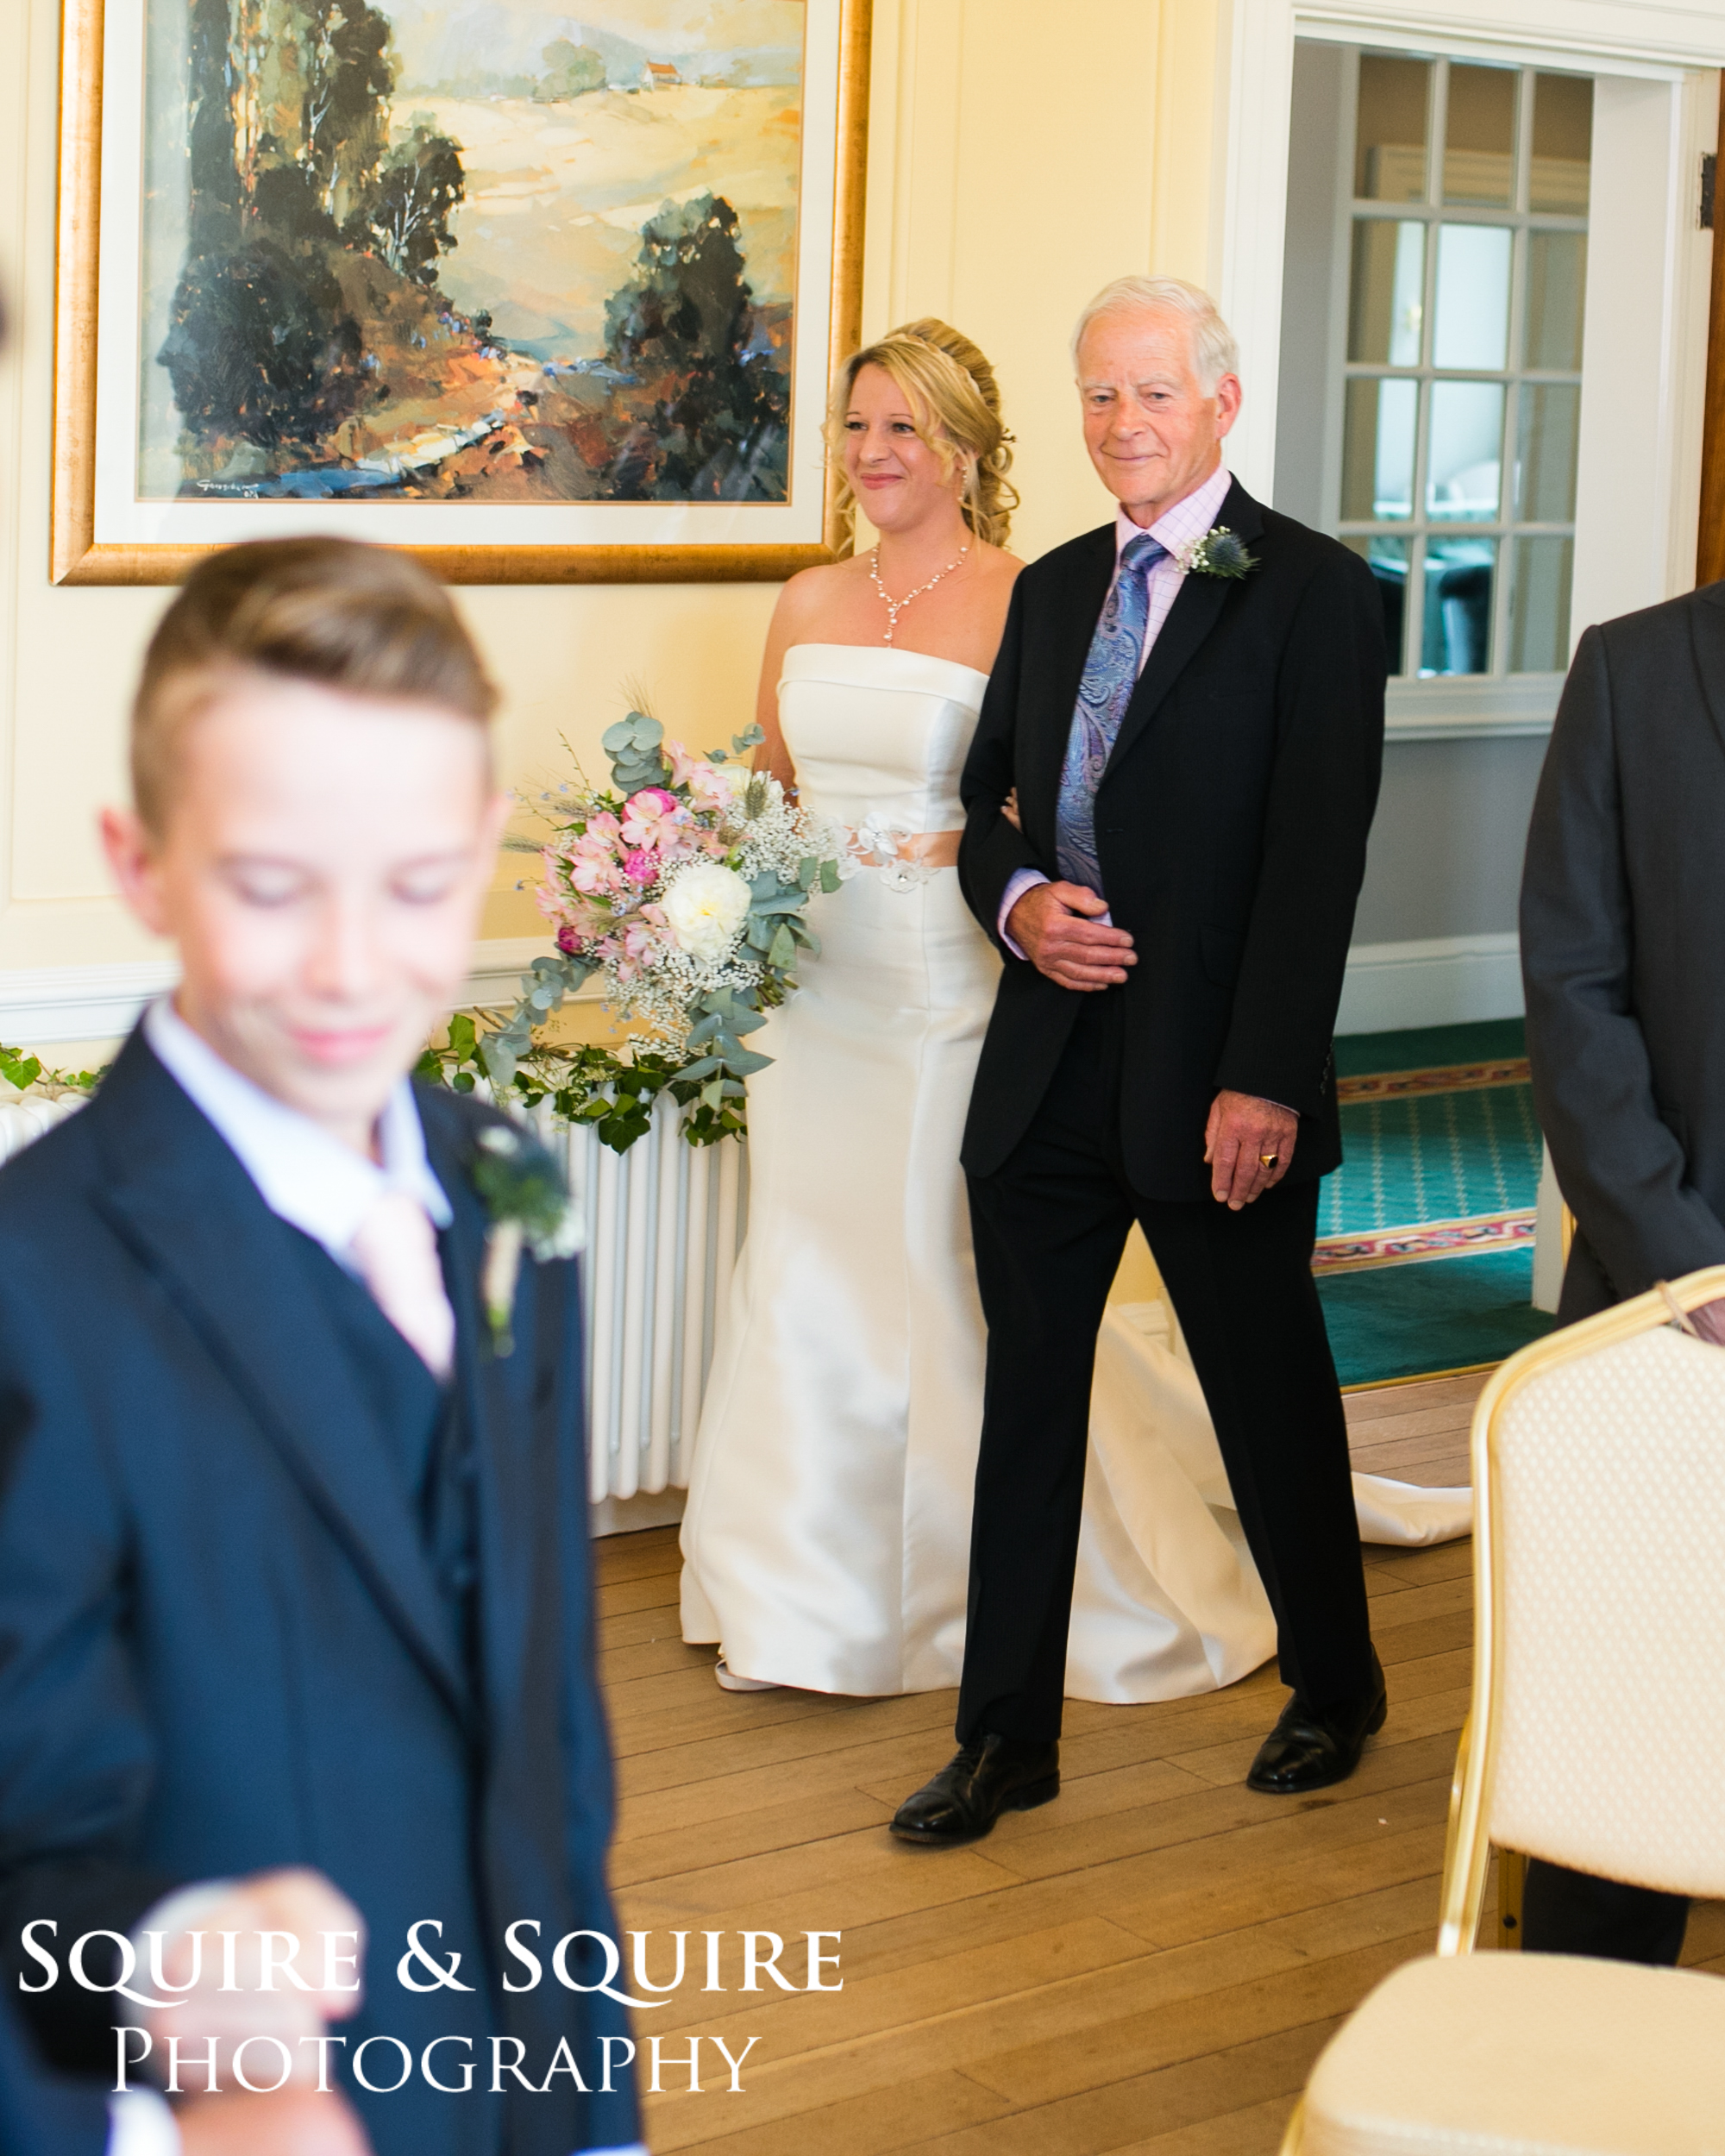 wedding_photography_catthorpe Manor (25 of 66).jpg